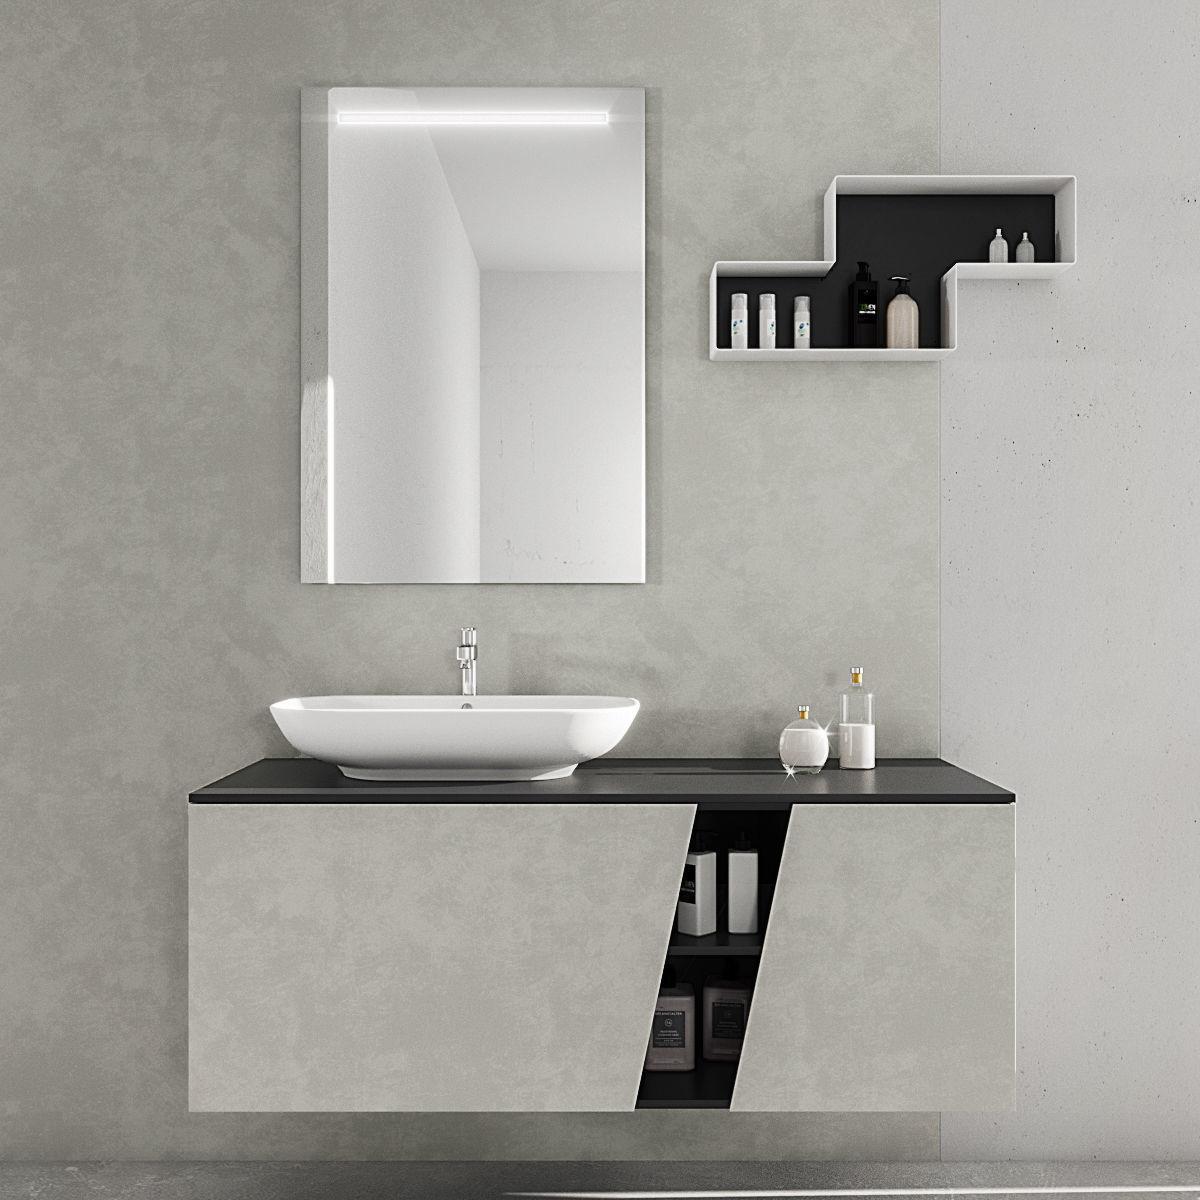 3D Bathroom furniture set Arcom eLy 2 | CGTrader